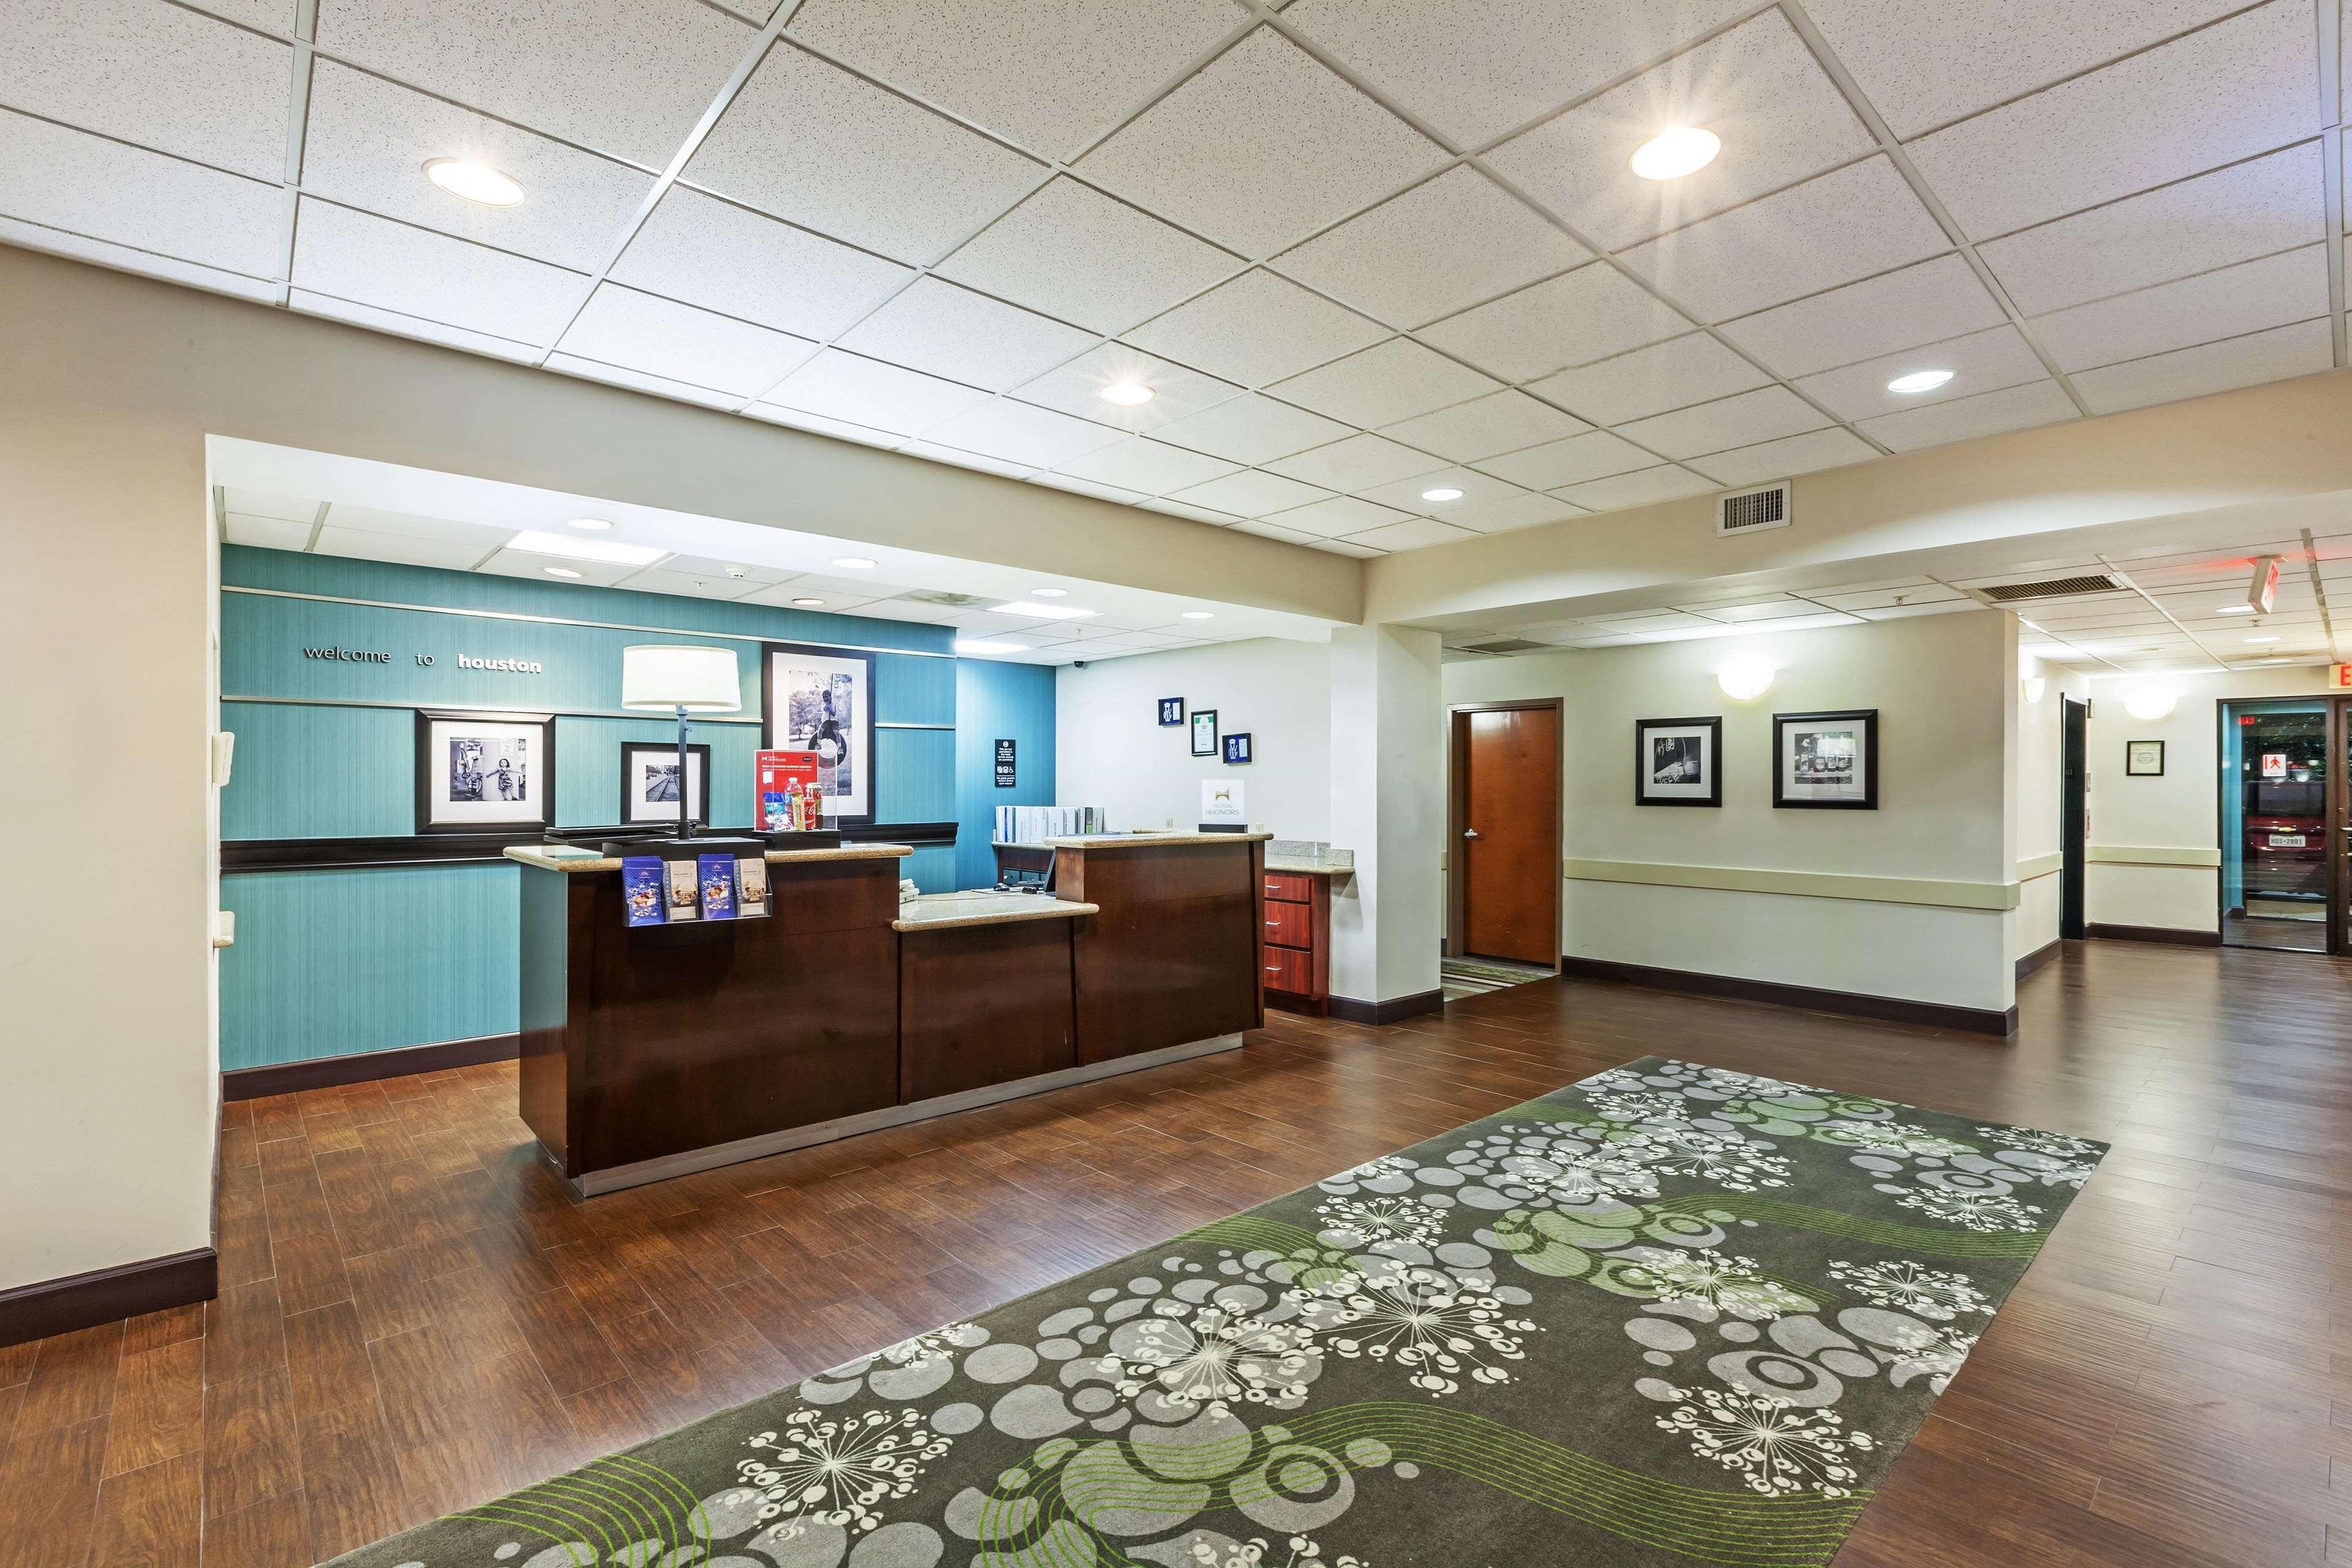 Hampton Inn & Suites Houston-Westchase image 4